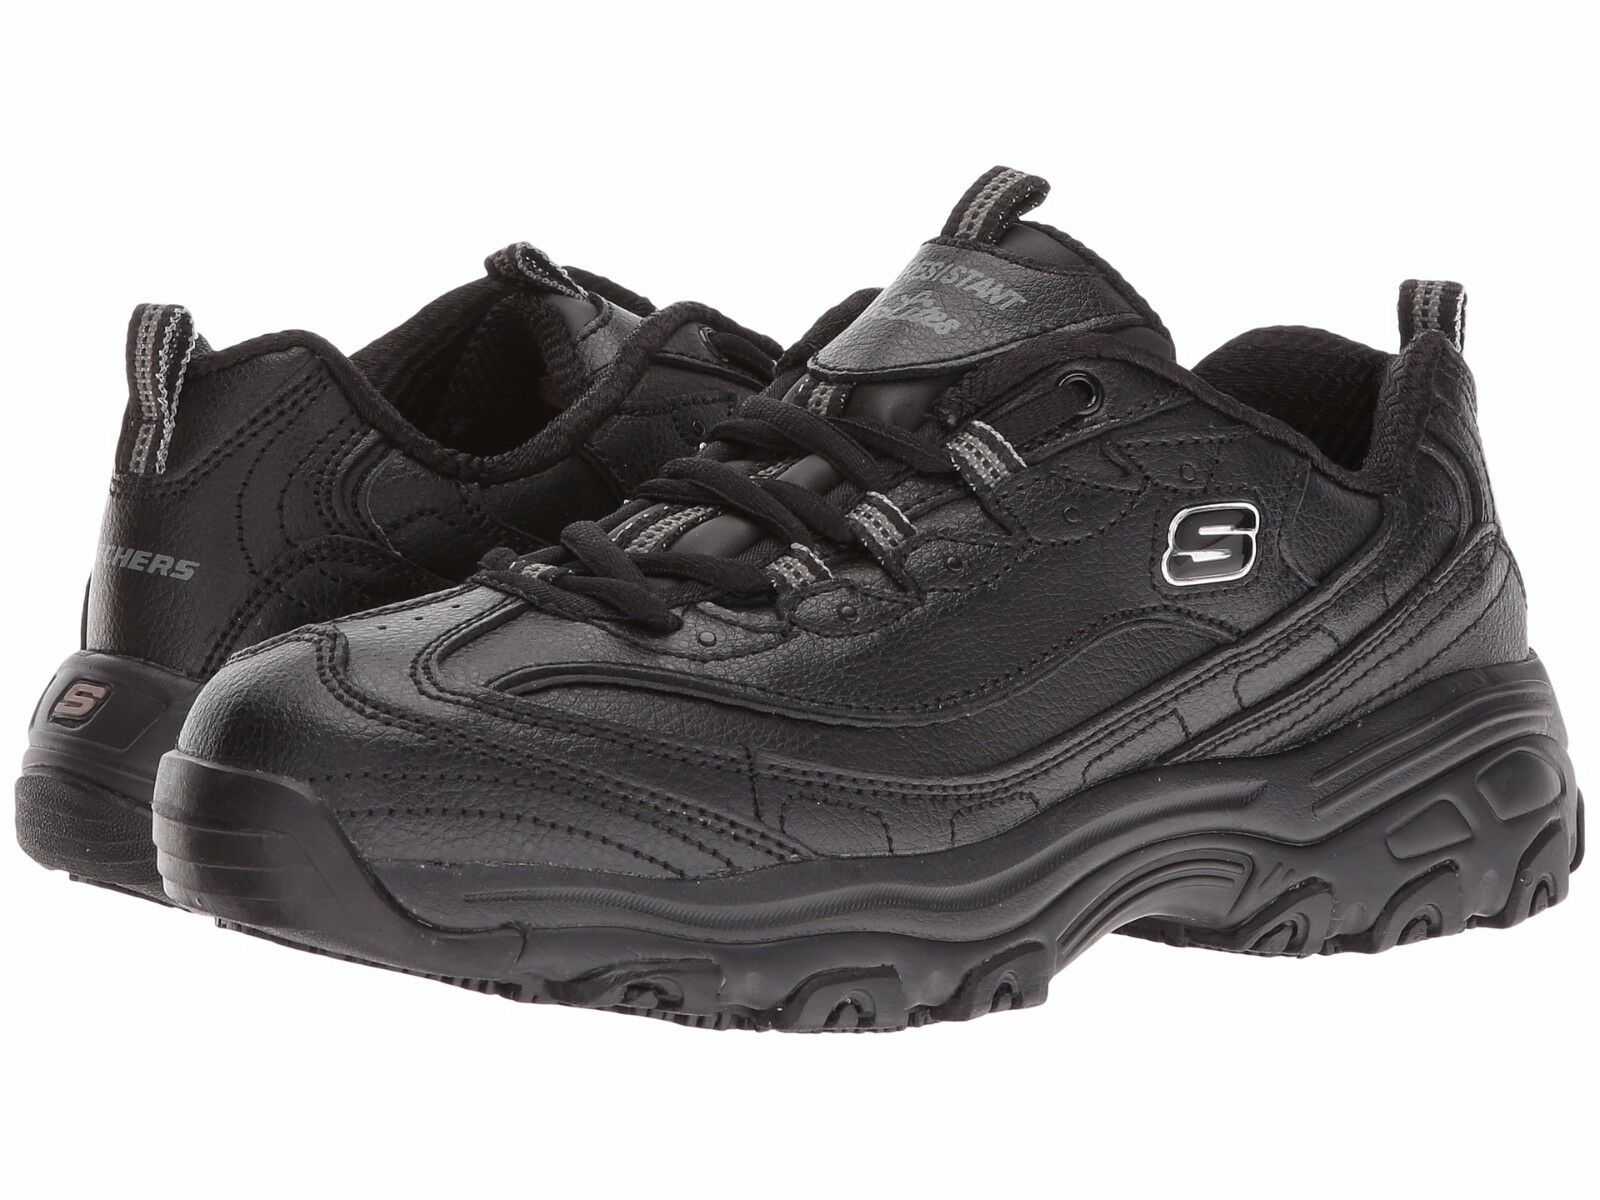 punto vendita Skechers Skechers Skechers DLITES SR-MARBLETON donna nero 76605 BLK Slip Resistant Work scarpe  buona qualità